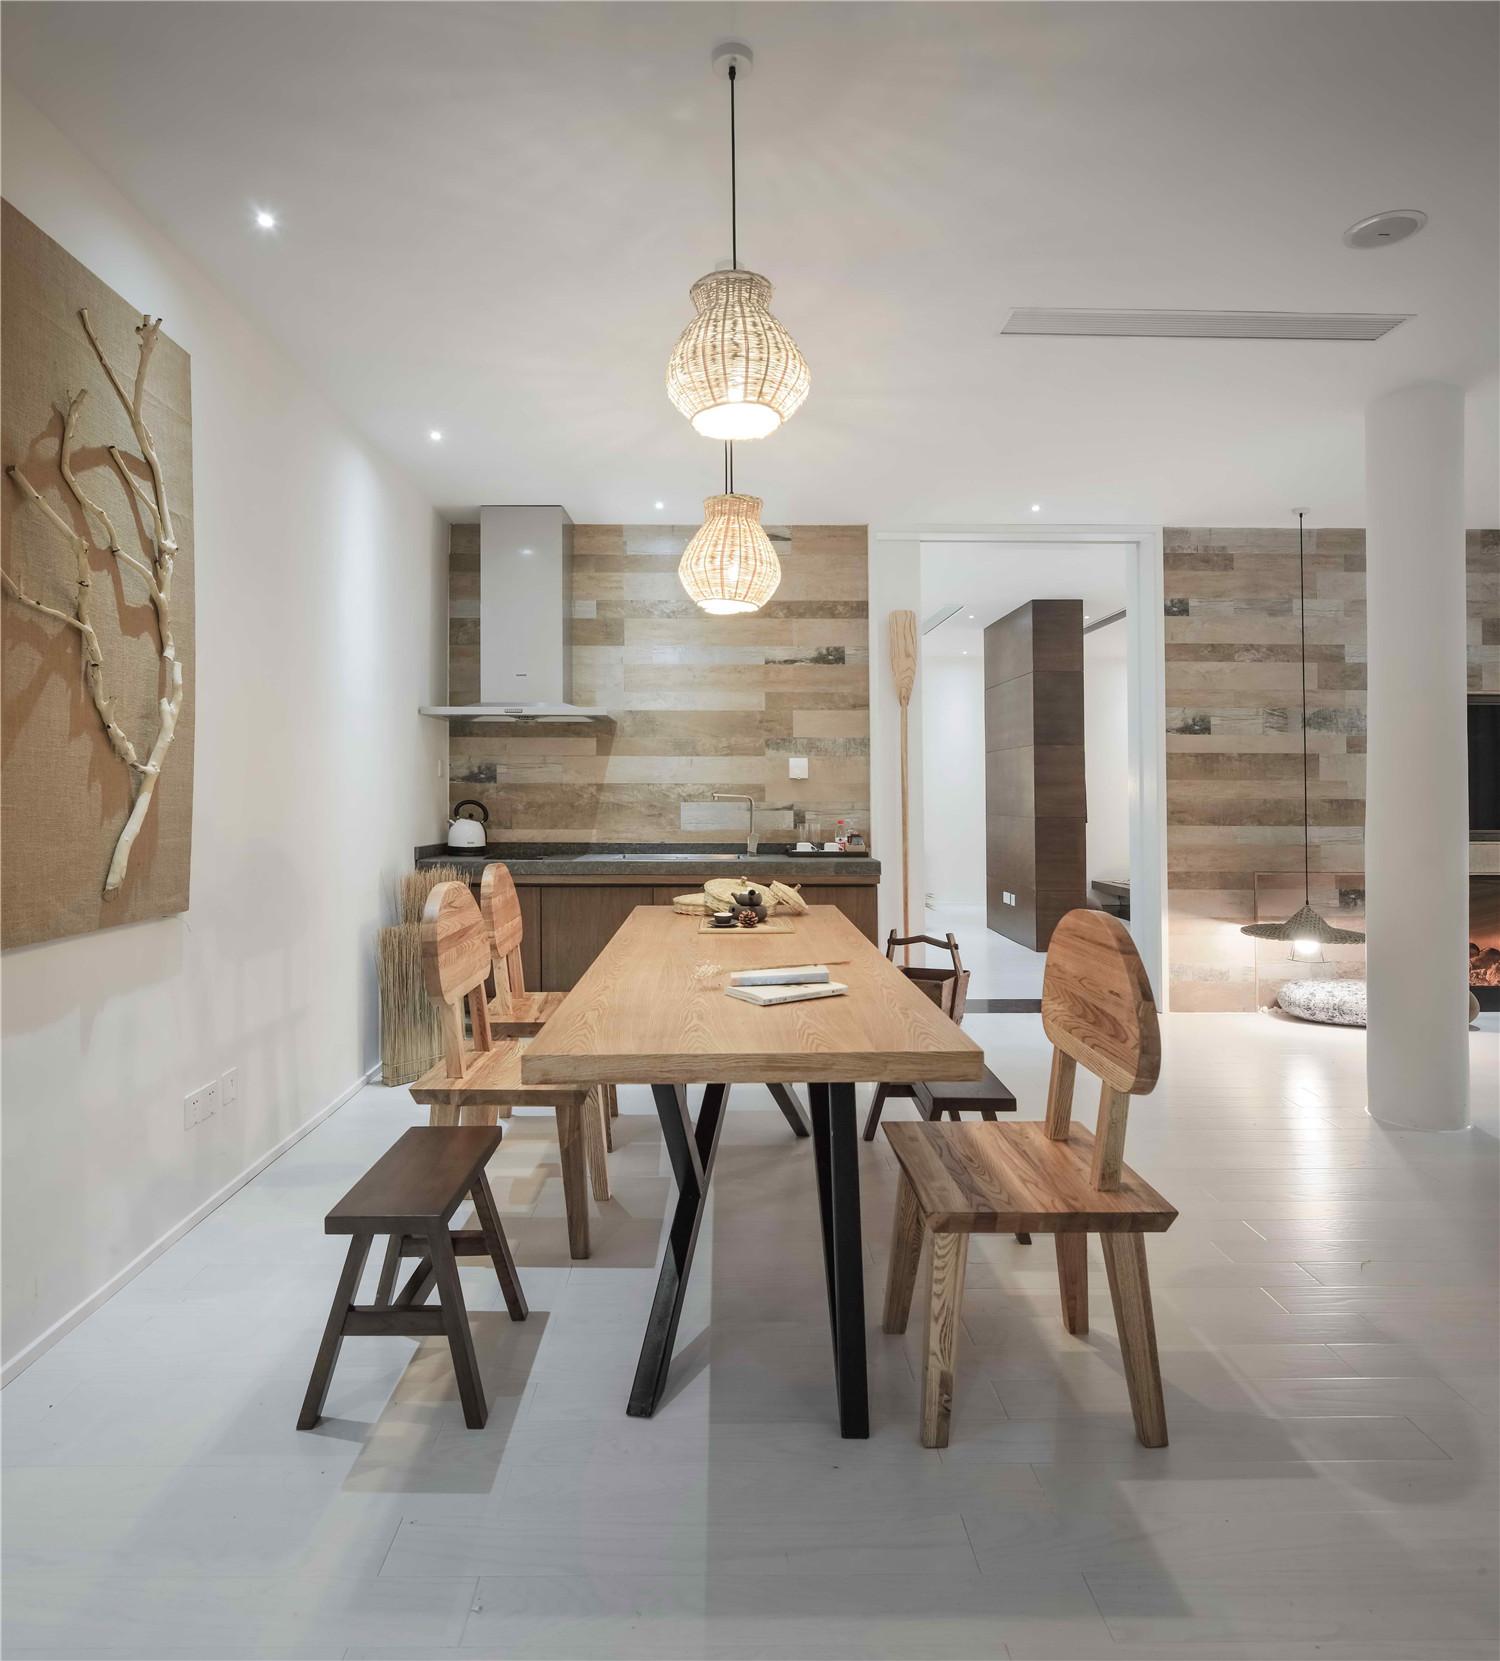 Ripple Hotel - Qiandao Lake design brief Hisheji (85)